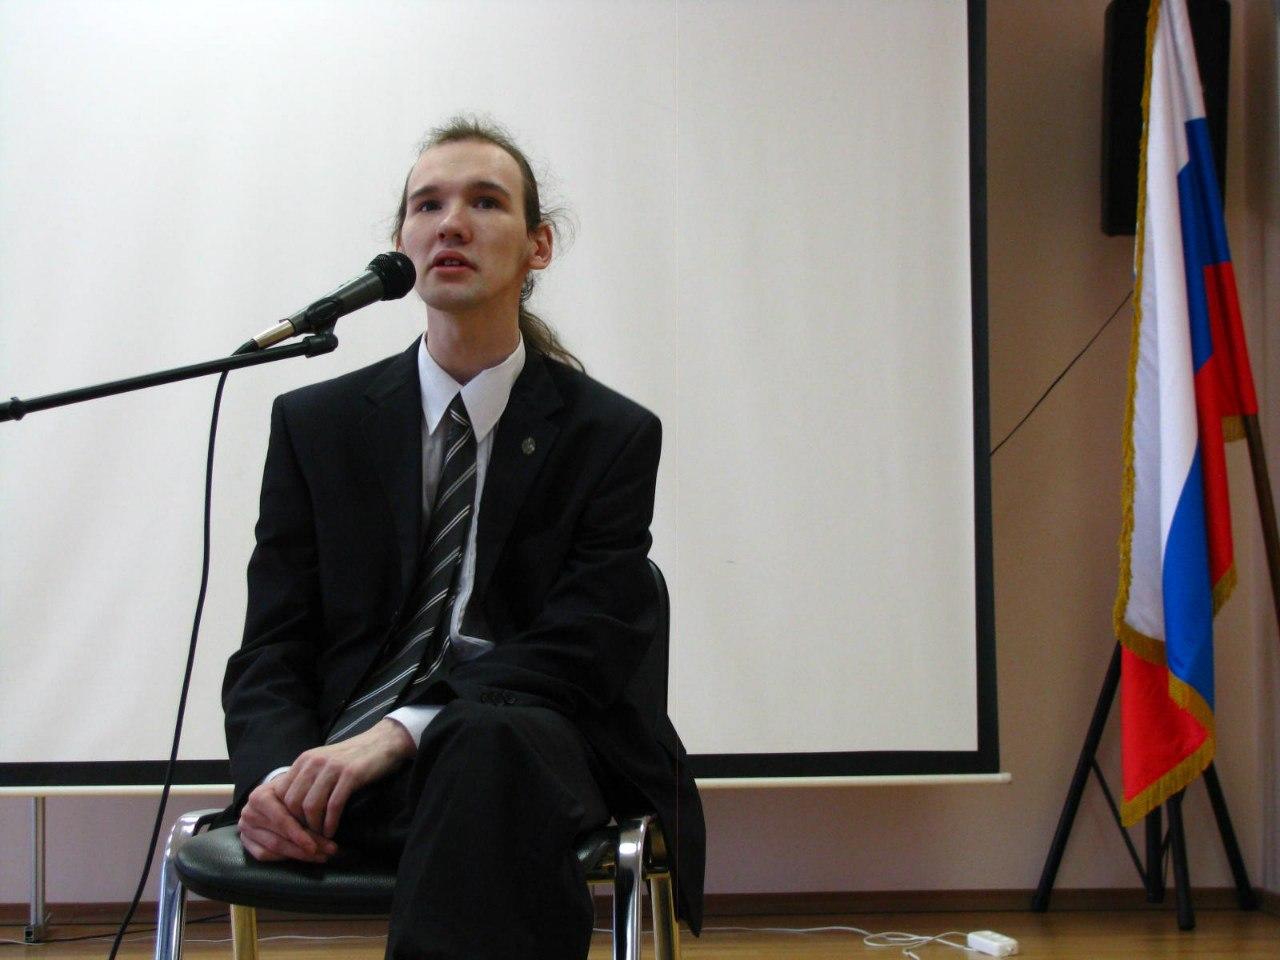 Школа-центр Динамика. поэт Александр Меркушев